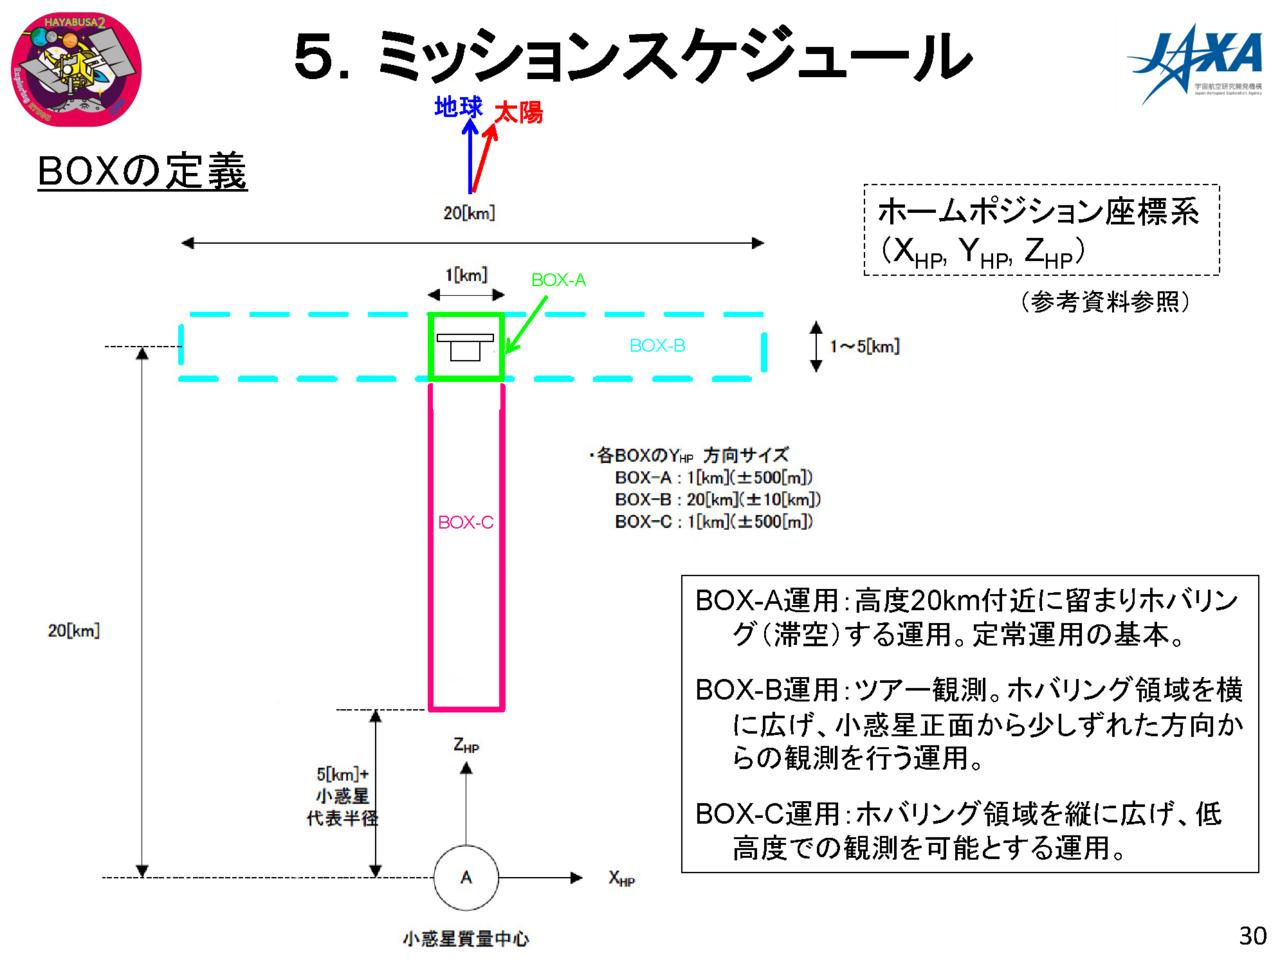 f:id:Imamura:20180719131725p:plain